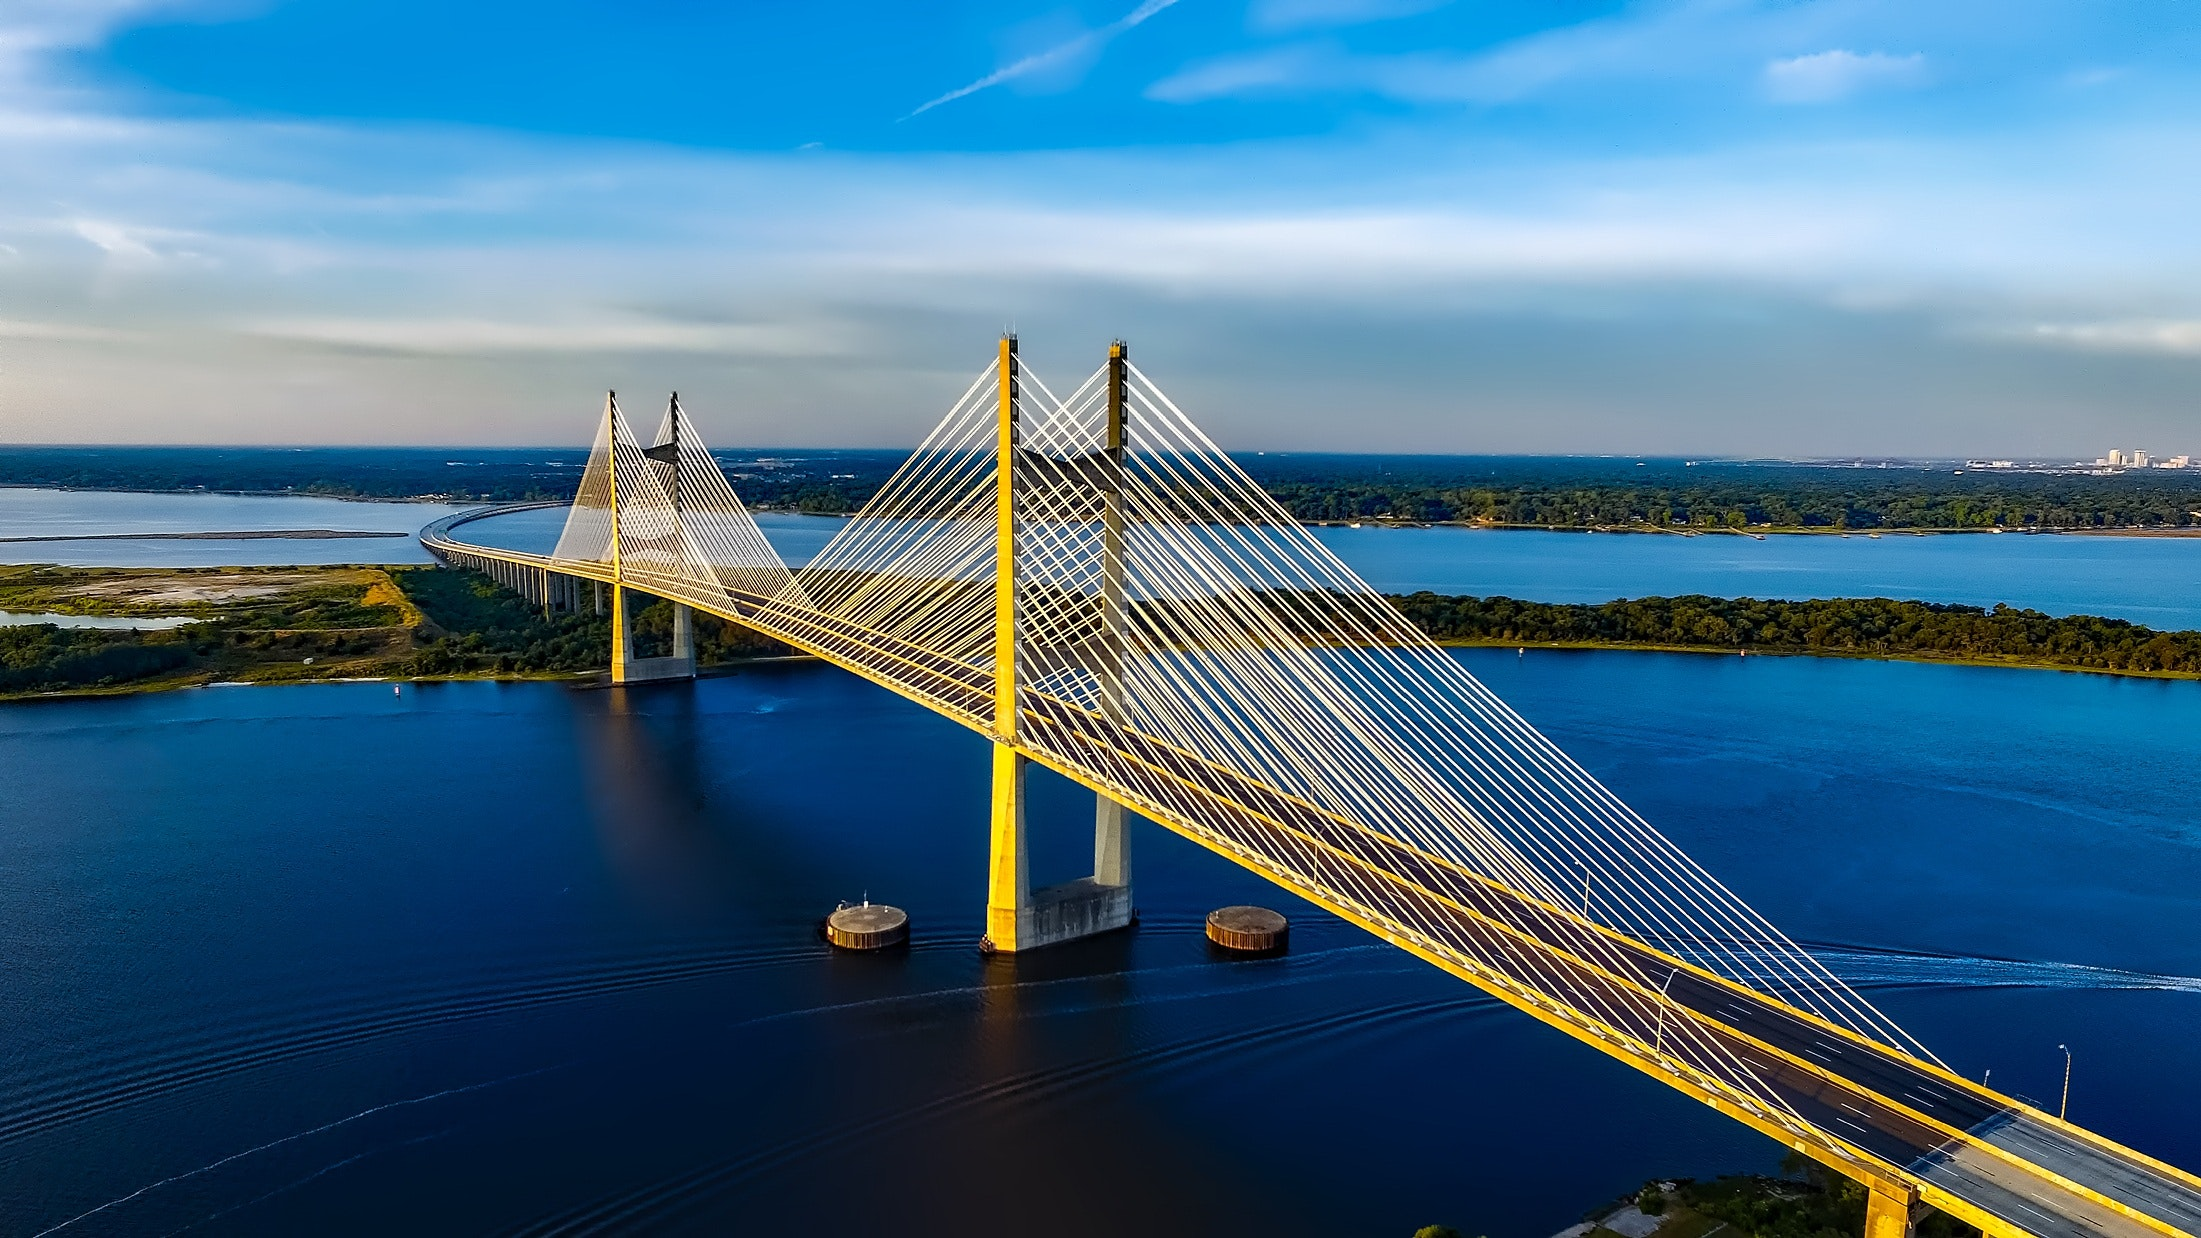 Smart Bridge